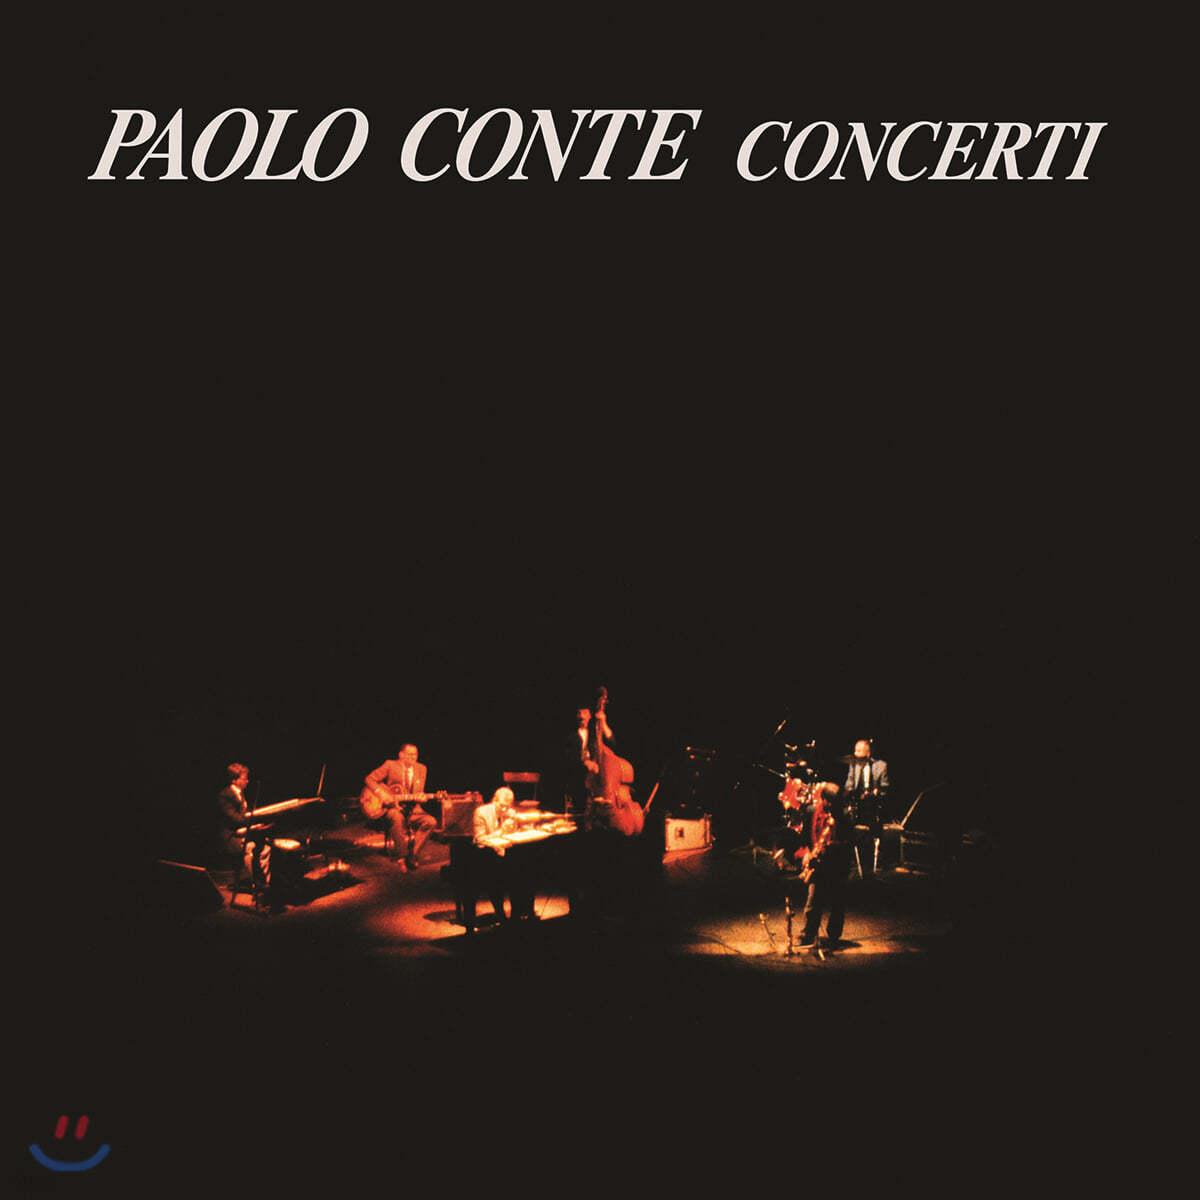 Paolo Conte (파올로 콩테) - Concerti [투명 크리스탈 컬러 2LP]